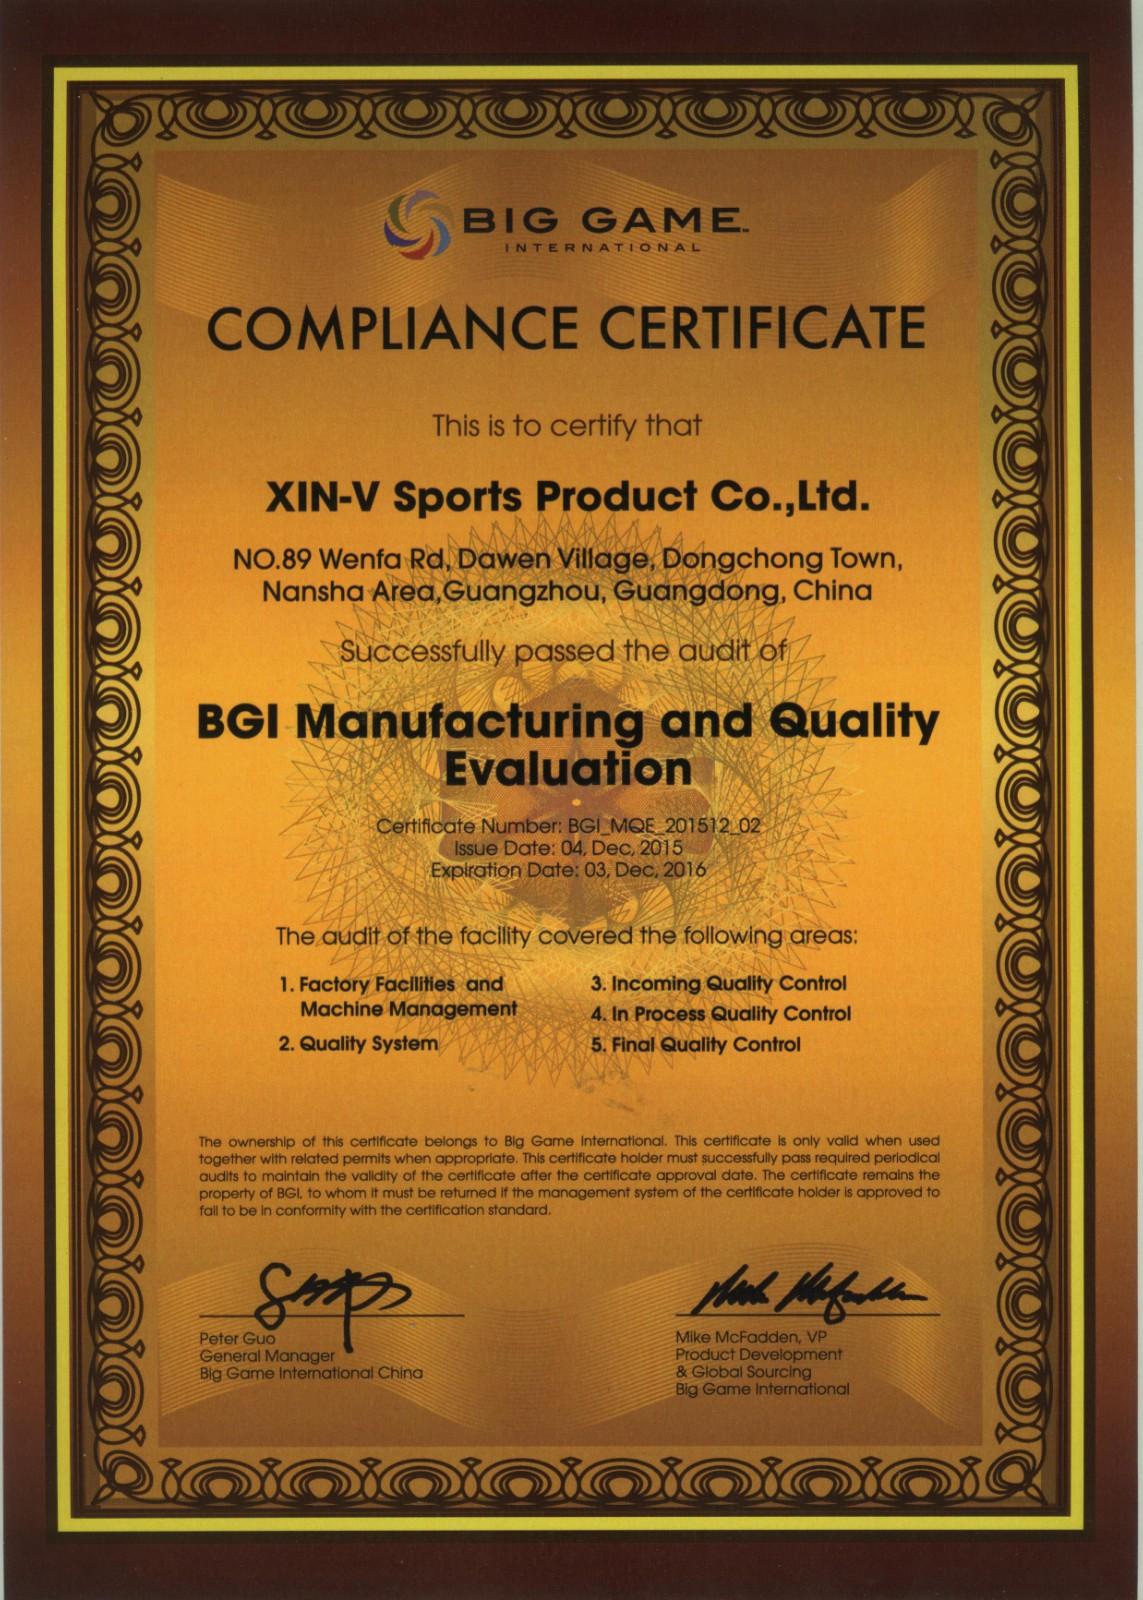 XIN-V -High-quality Soft Plastics For Bass | Xin-v Soft Lure Wma50 Free Sample 50mm 1-5